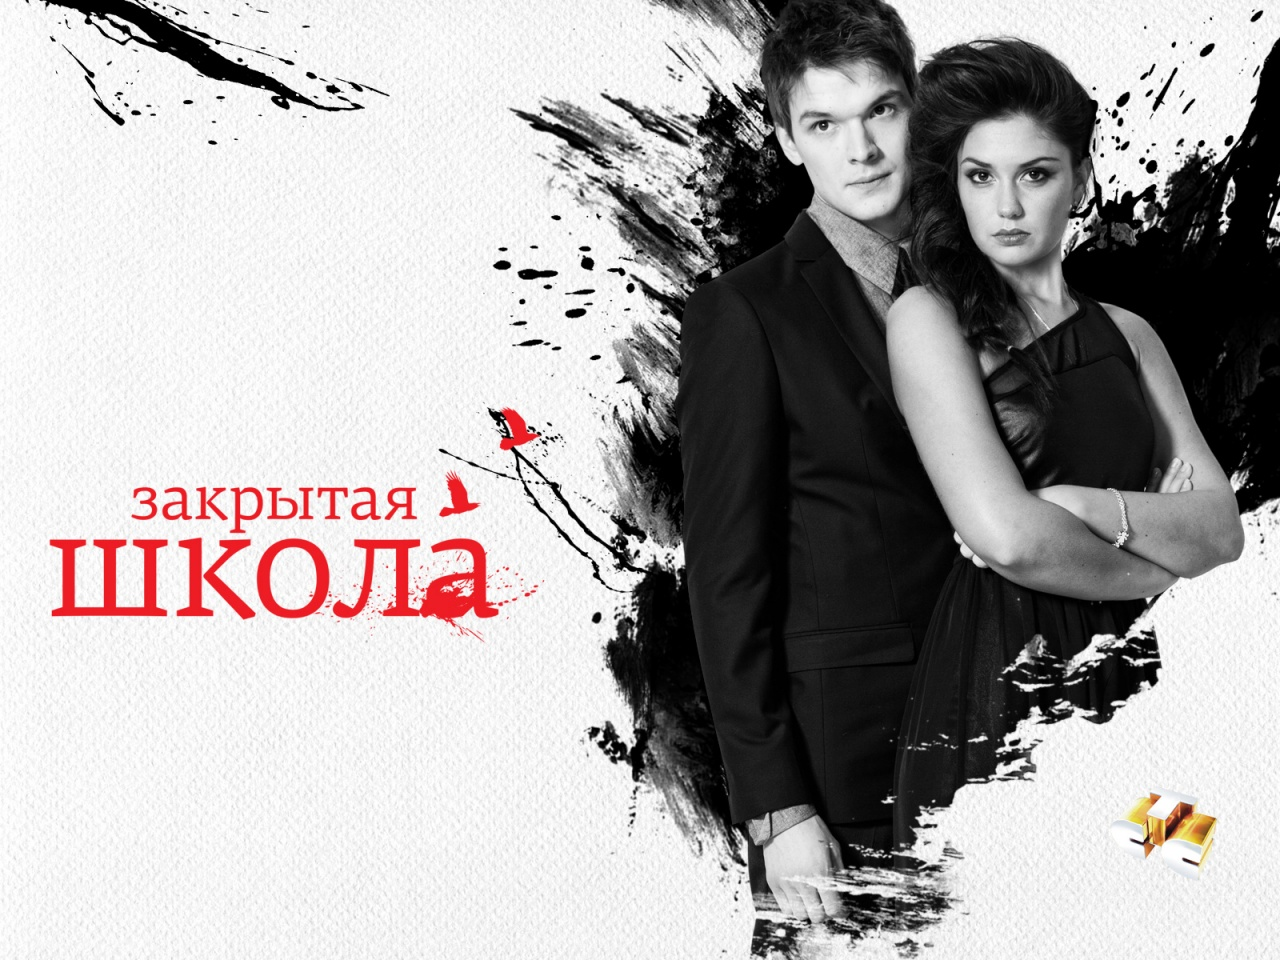 Обои: Закрытая школа: www.kinopoisk.ru/picture/1874792/w_size/1280